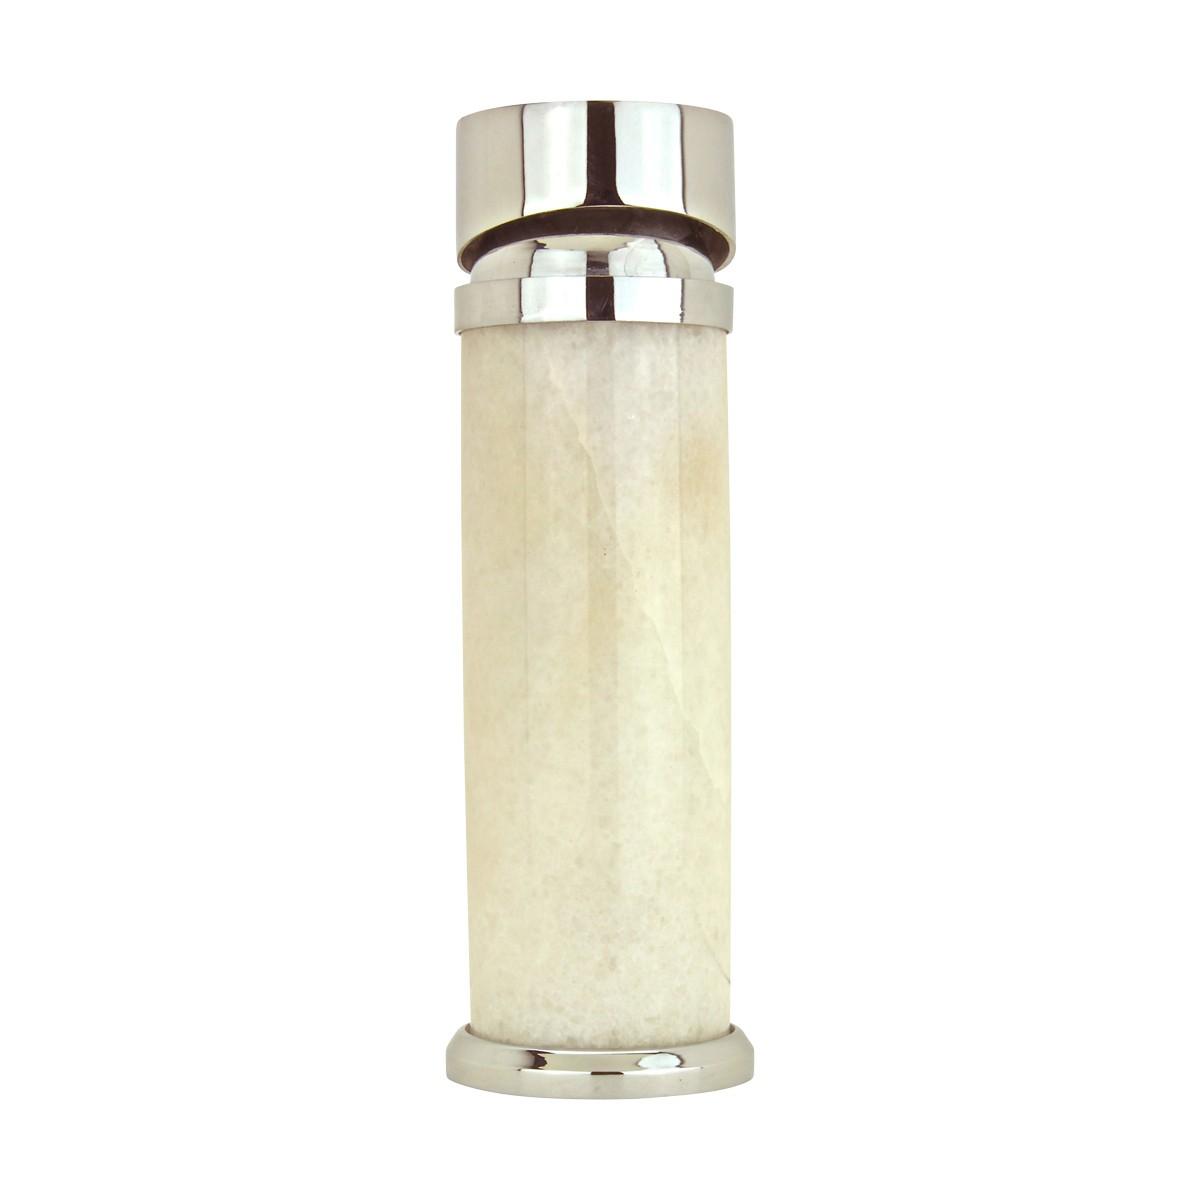 Alabaster Marble Chrome Bathroom Faucet Single Hole 1 Handle Faucets Bathroom Faucets Single Hole Faucet